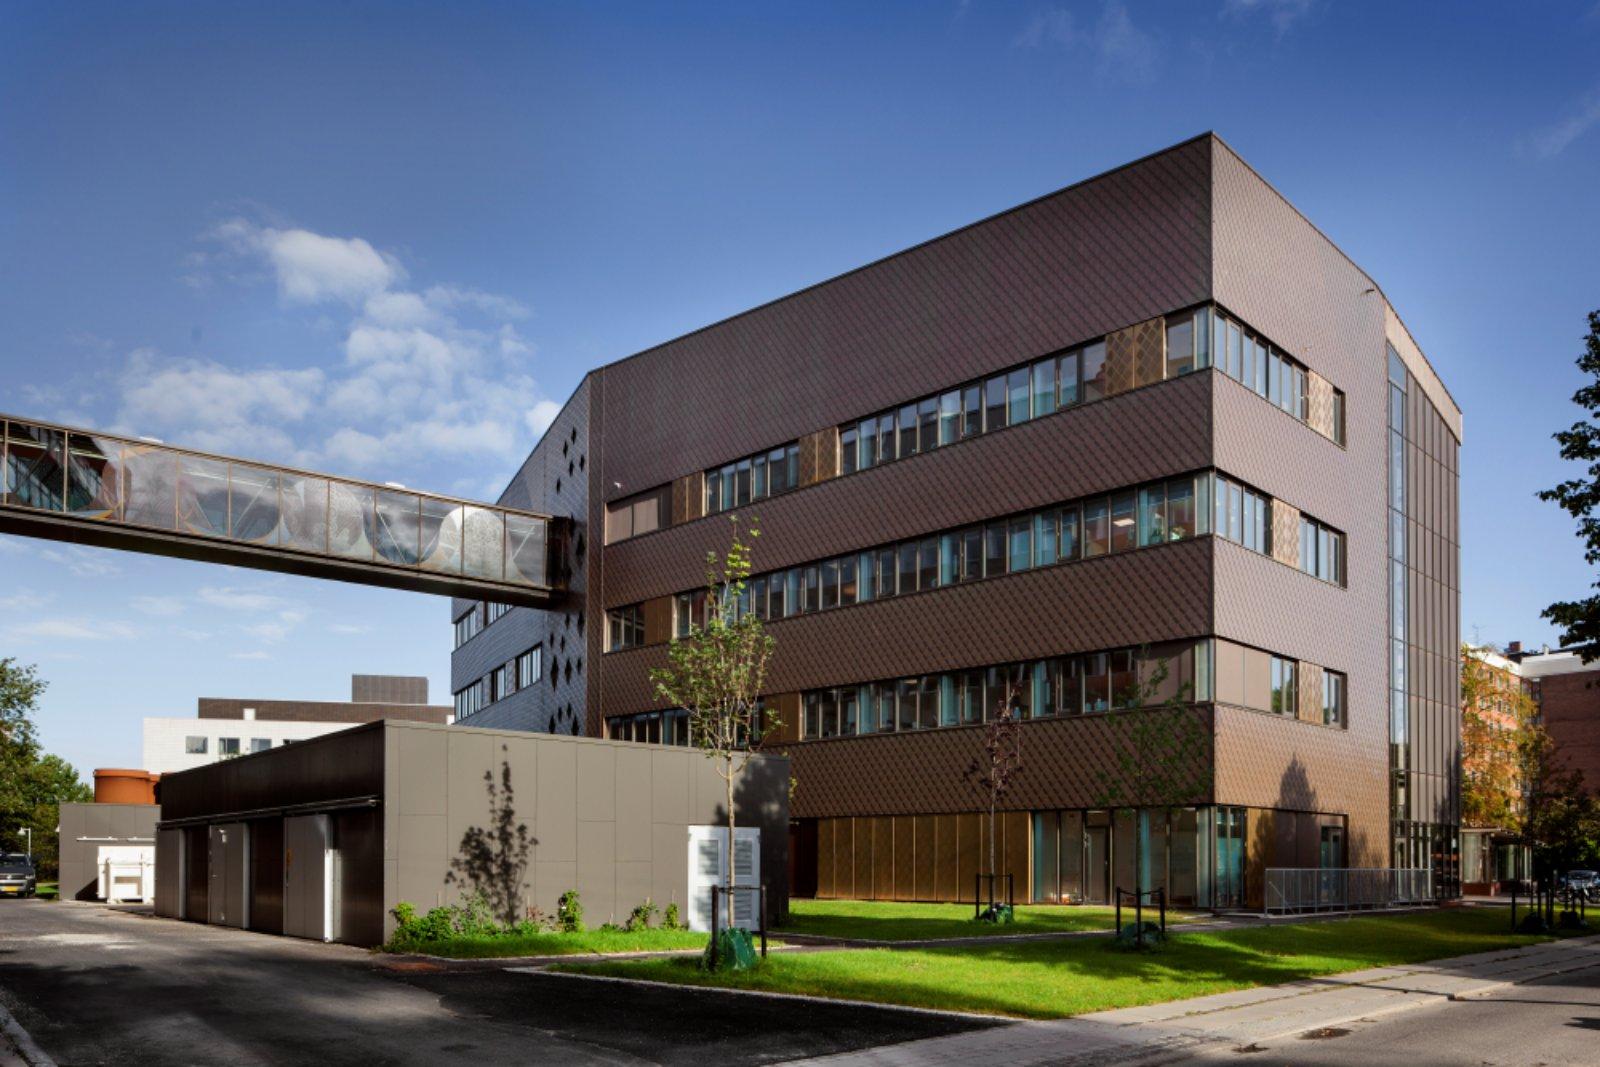 The Pharma Science Building